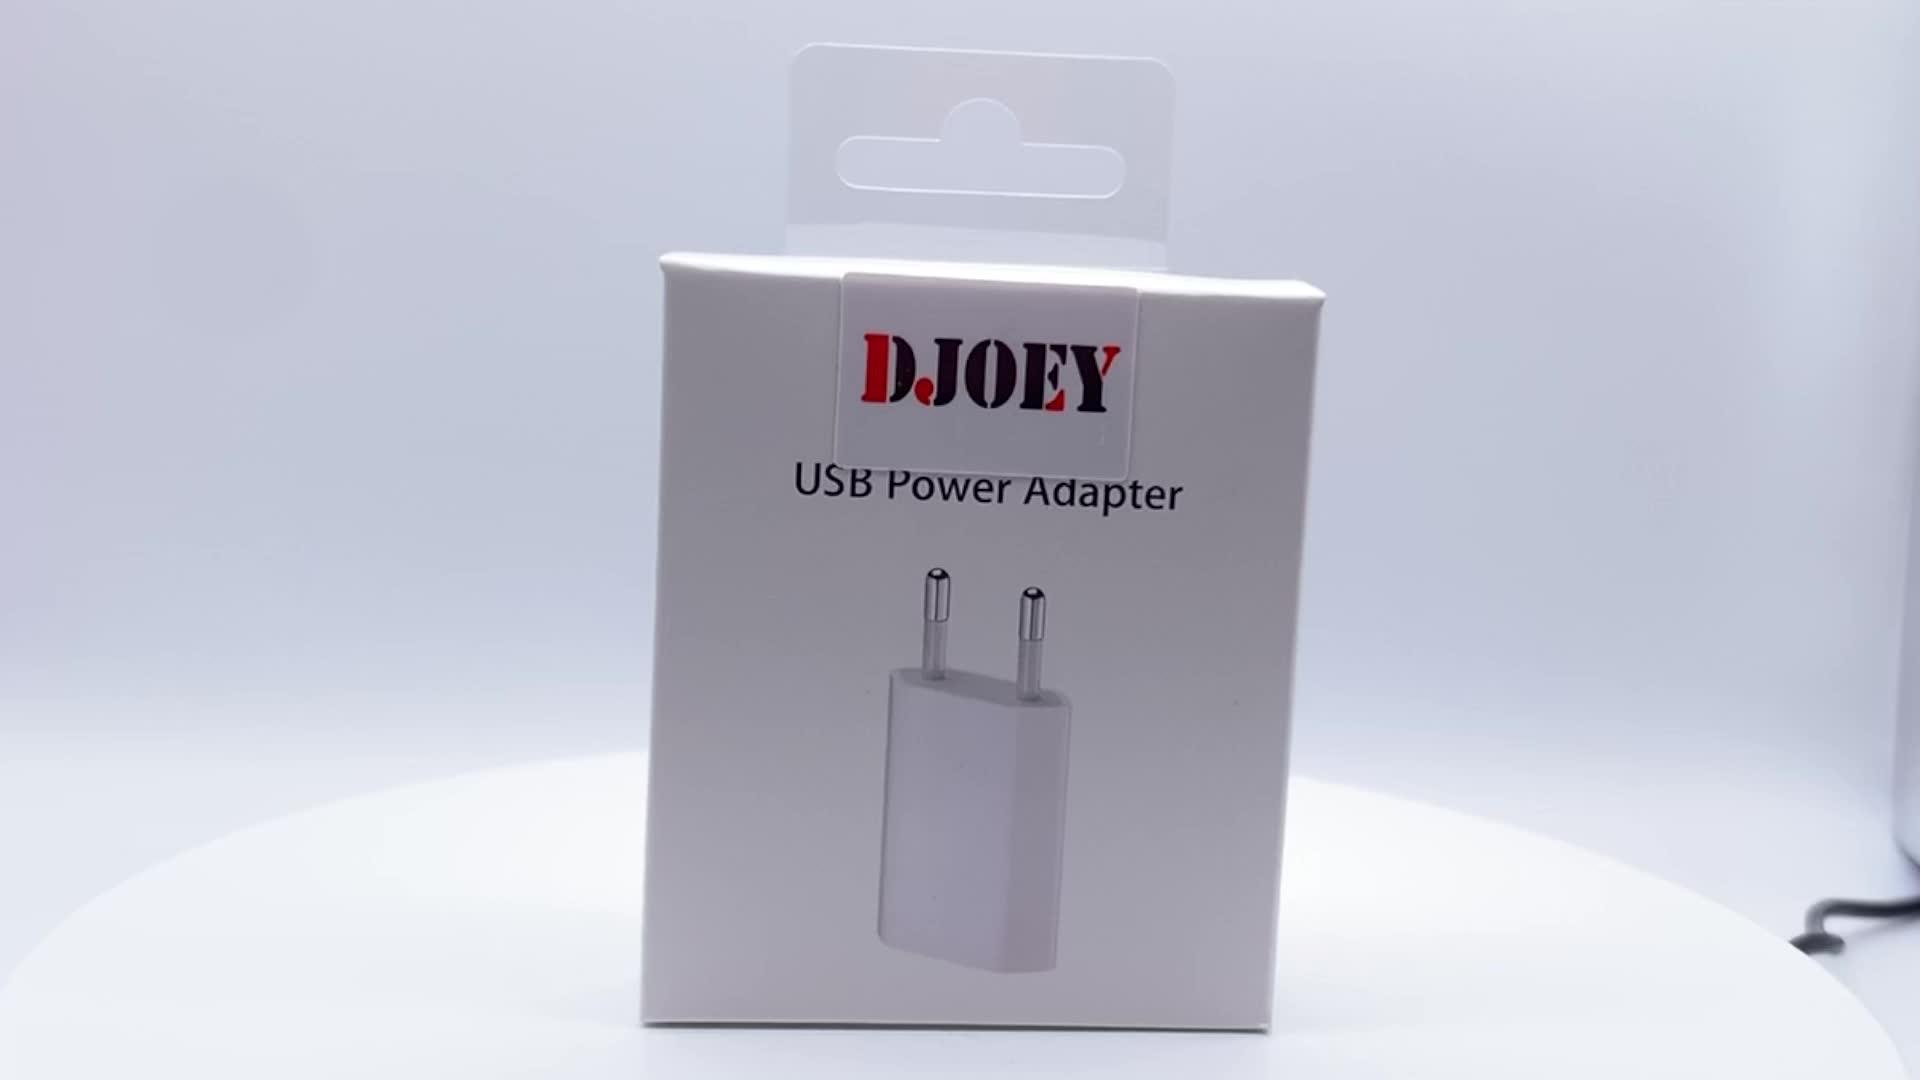 Djoey Orijinal Kalite USB Güç Adaptörü A1400 5 W AB Tak USB Duvar Ev iphone şarj cihazı 6 6 s 7 8 artı X MD813 ambalaj ile